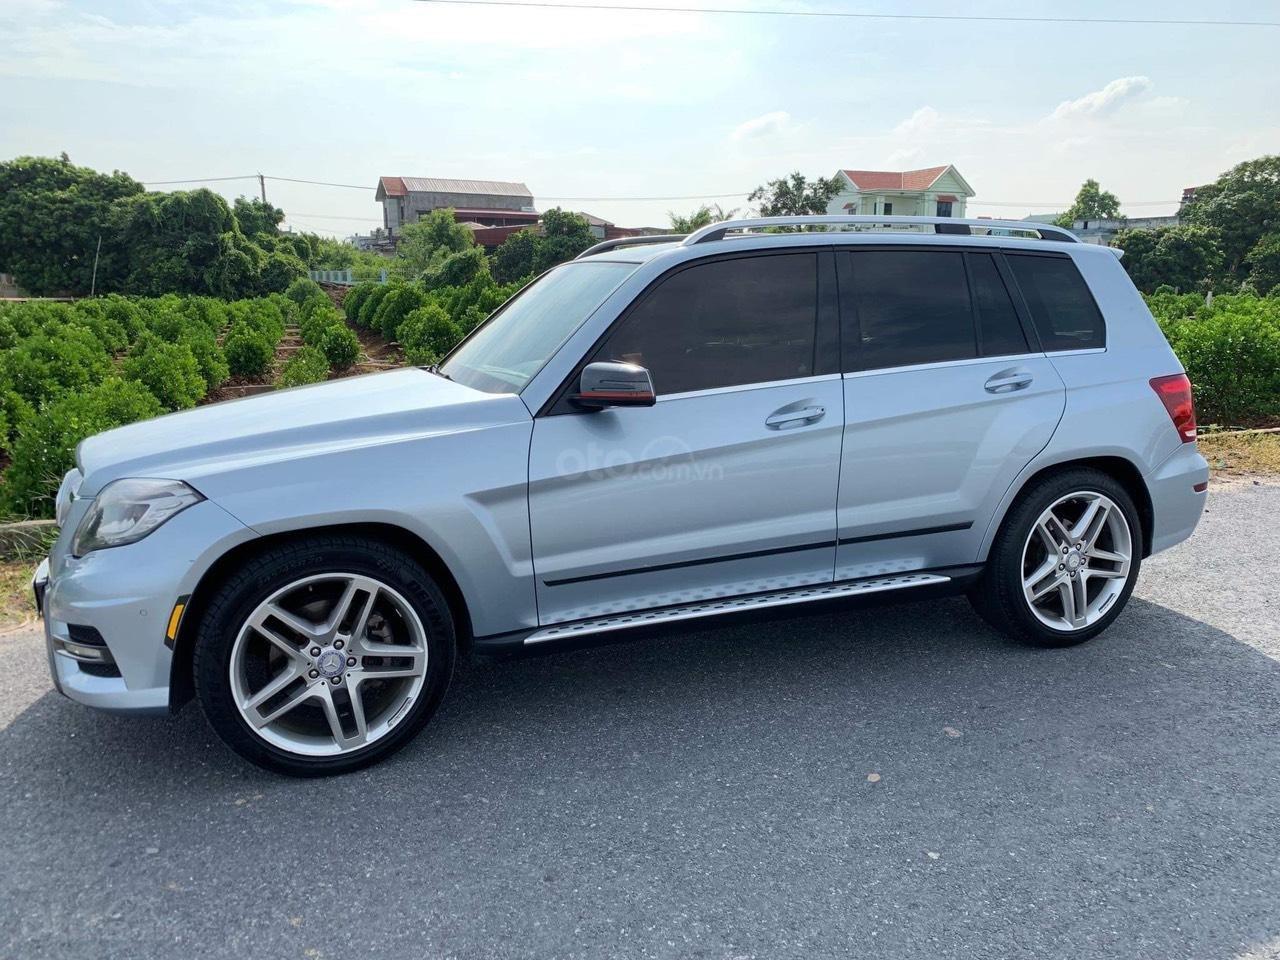 [0916821161] Mercedes-Benz GLK AMG (2)